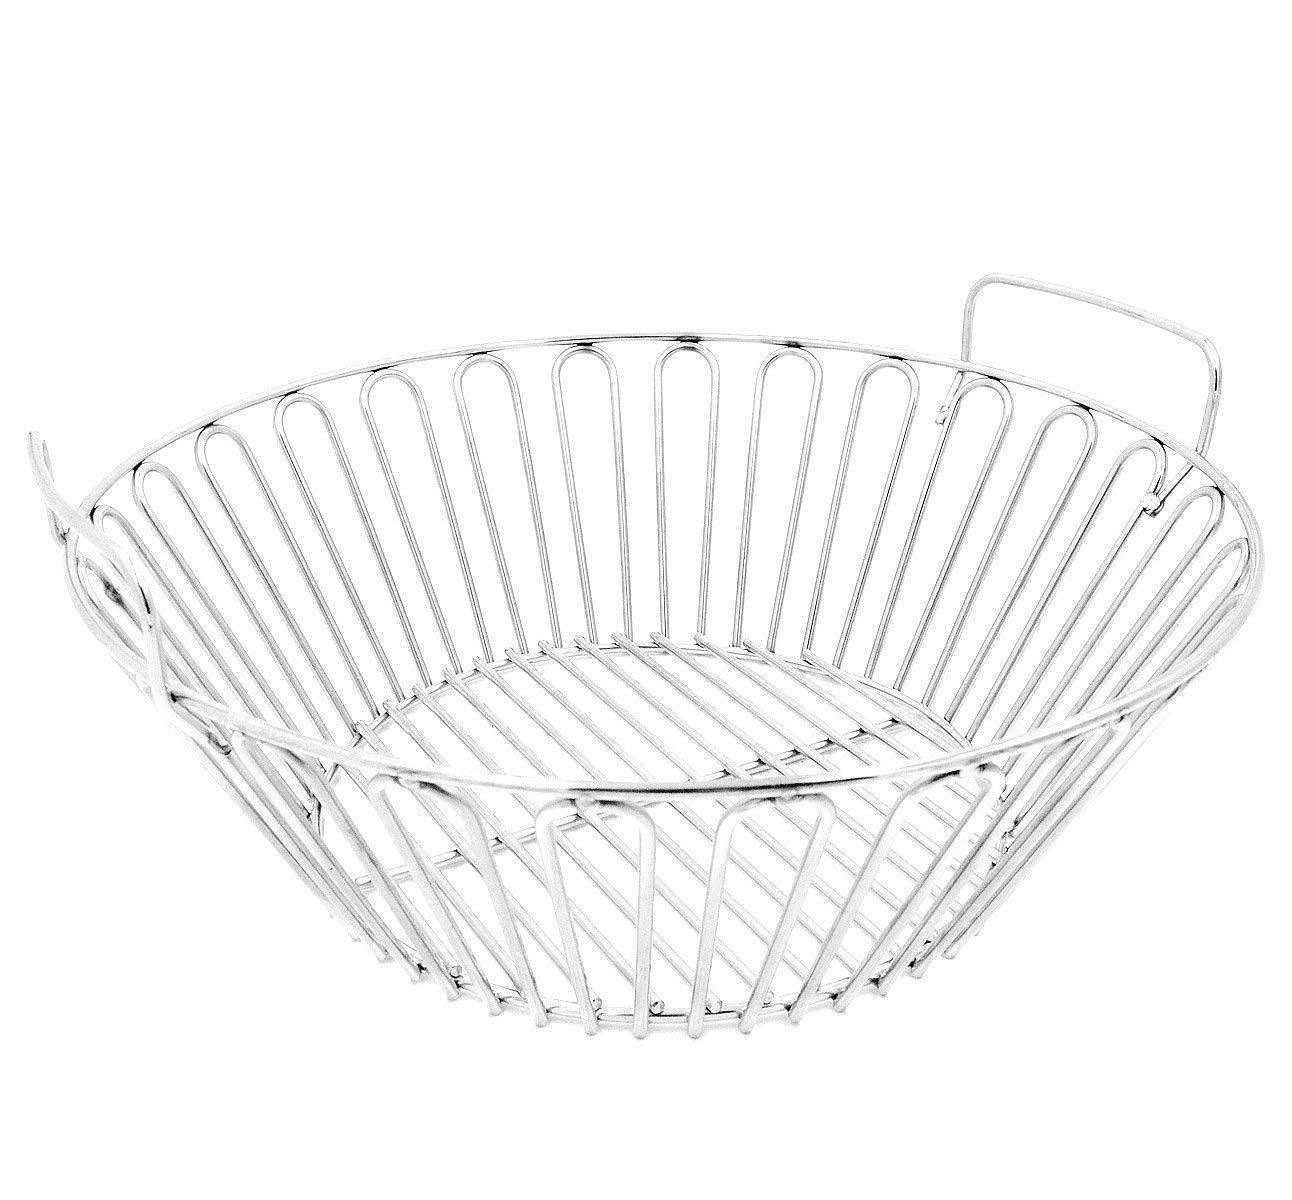 7daacdb5c7ce6 Get Quotations · RunTo 13.5 inch Charcoal Ash Basket Fits for Large Big  Green Egg Grill, Kamado Joe